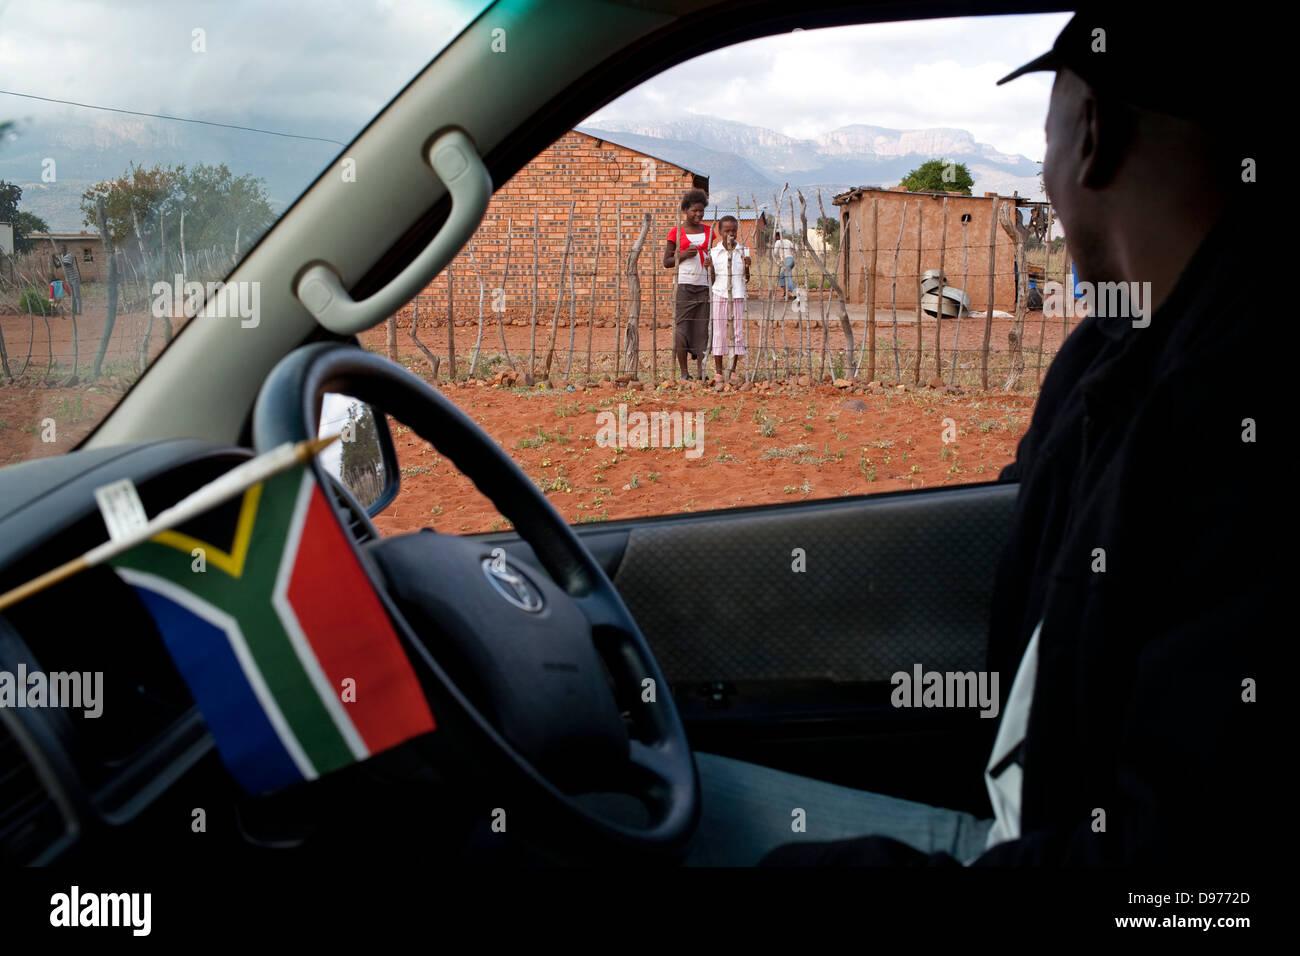 Fairbrigdge Seleka 48 drives though Burgerrecht village to pick up football fans transport them to Fan park in Eldorado - Stock Image